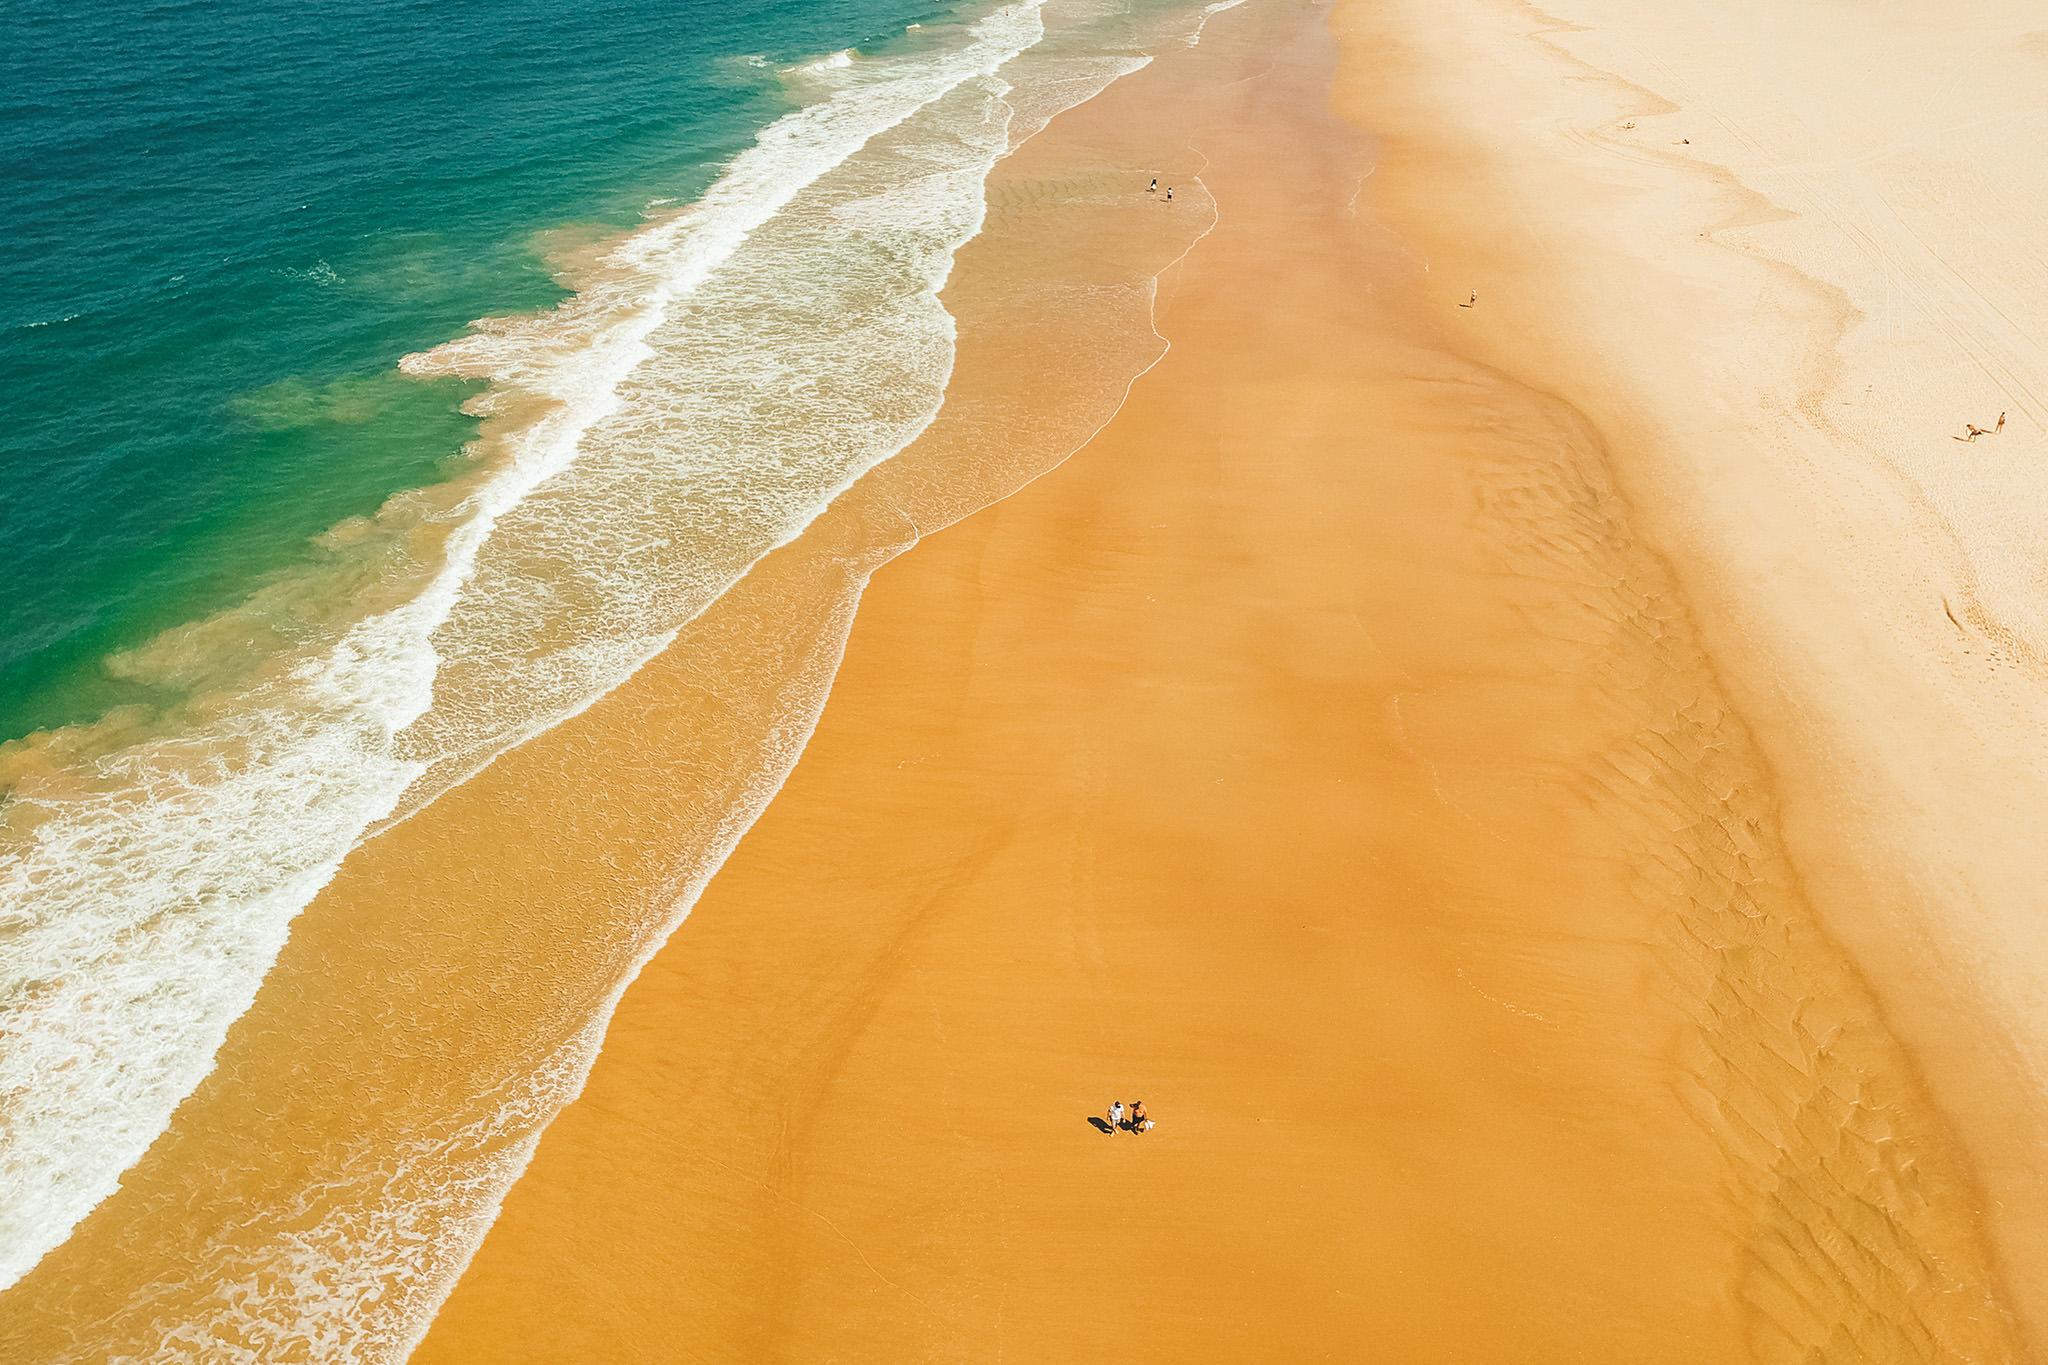 Drone Shot of beach at Gold Coast